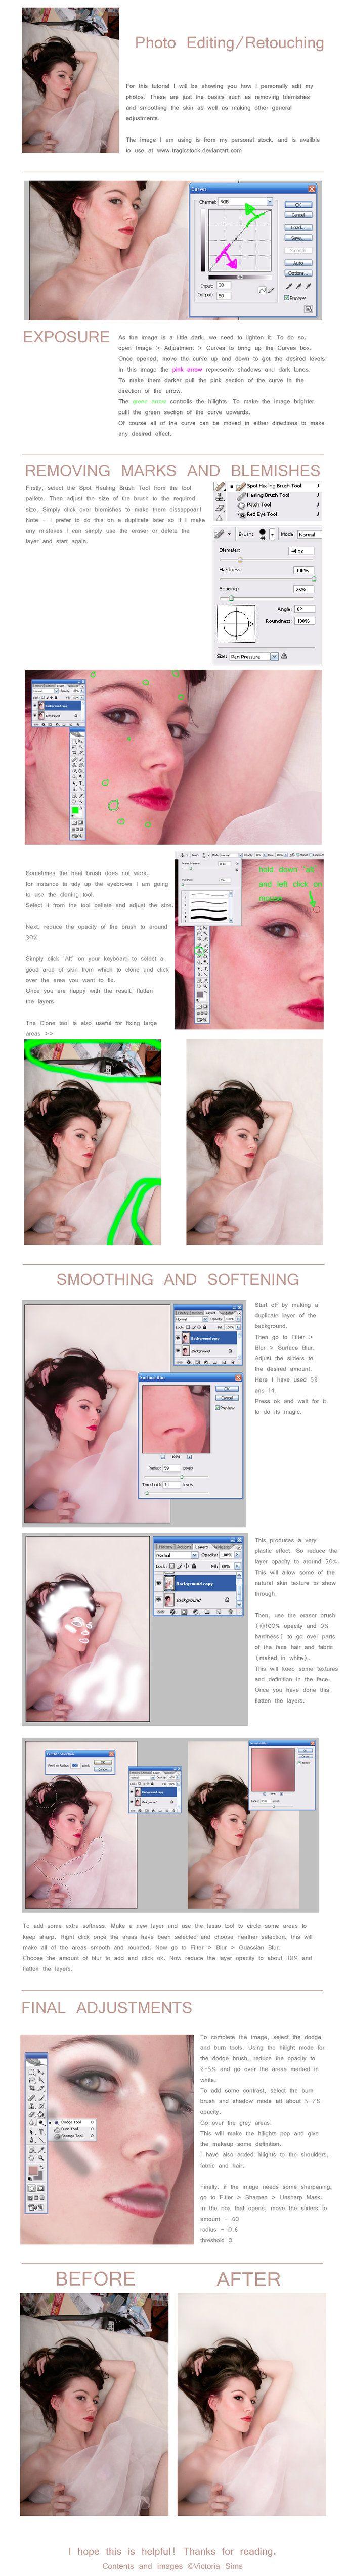 Basic Photo Editing Tutorial by TheTragicTruth-Of-Me.deviantart.com on @DeviantArt